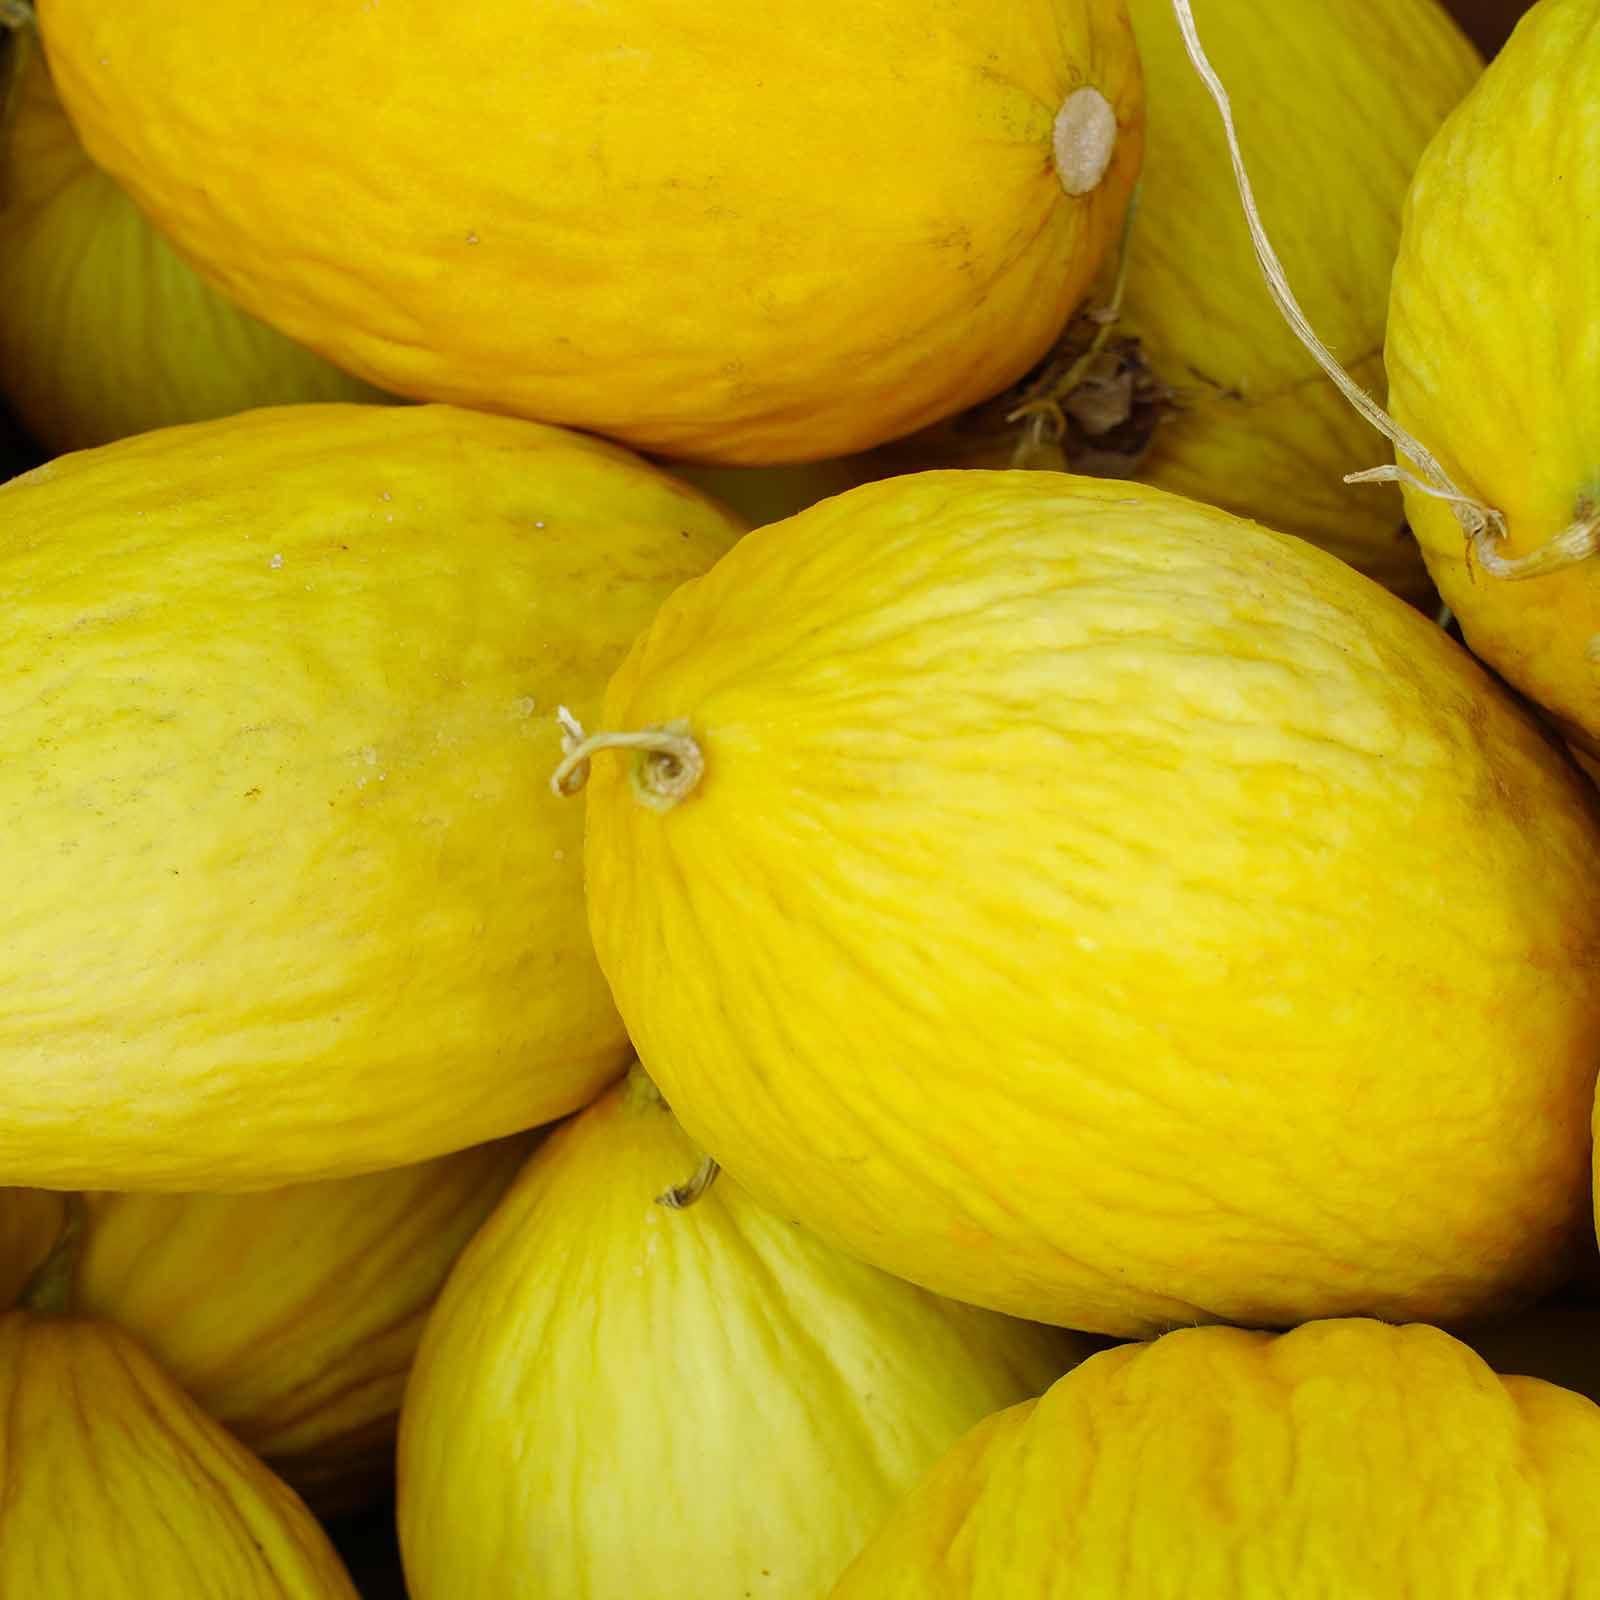 Crenshaw Melon Garden Seeds - 1 Oz - Non-GMO, Heirloom Vegetable Gardening Seeds - Fruit